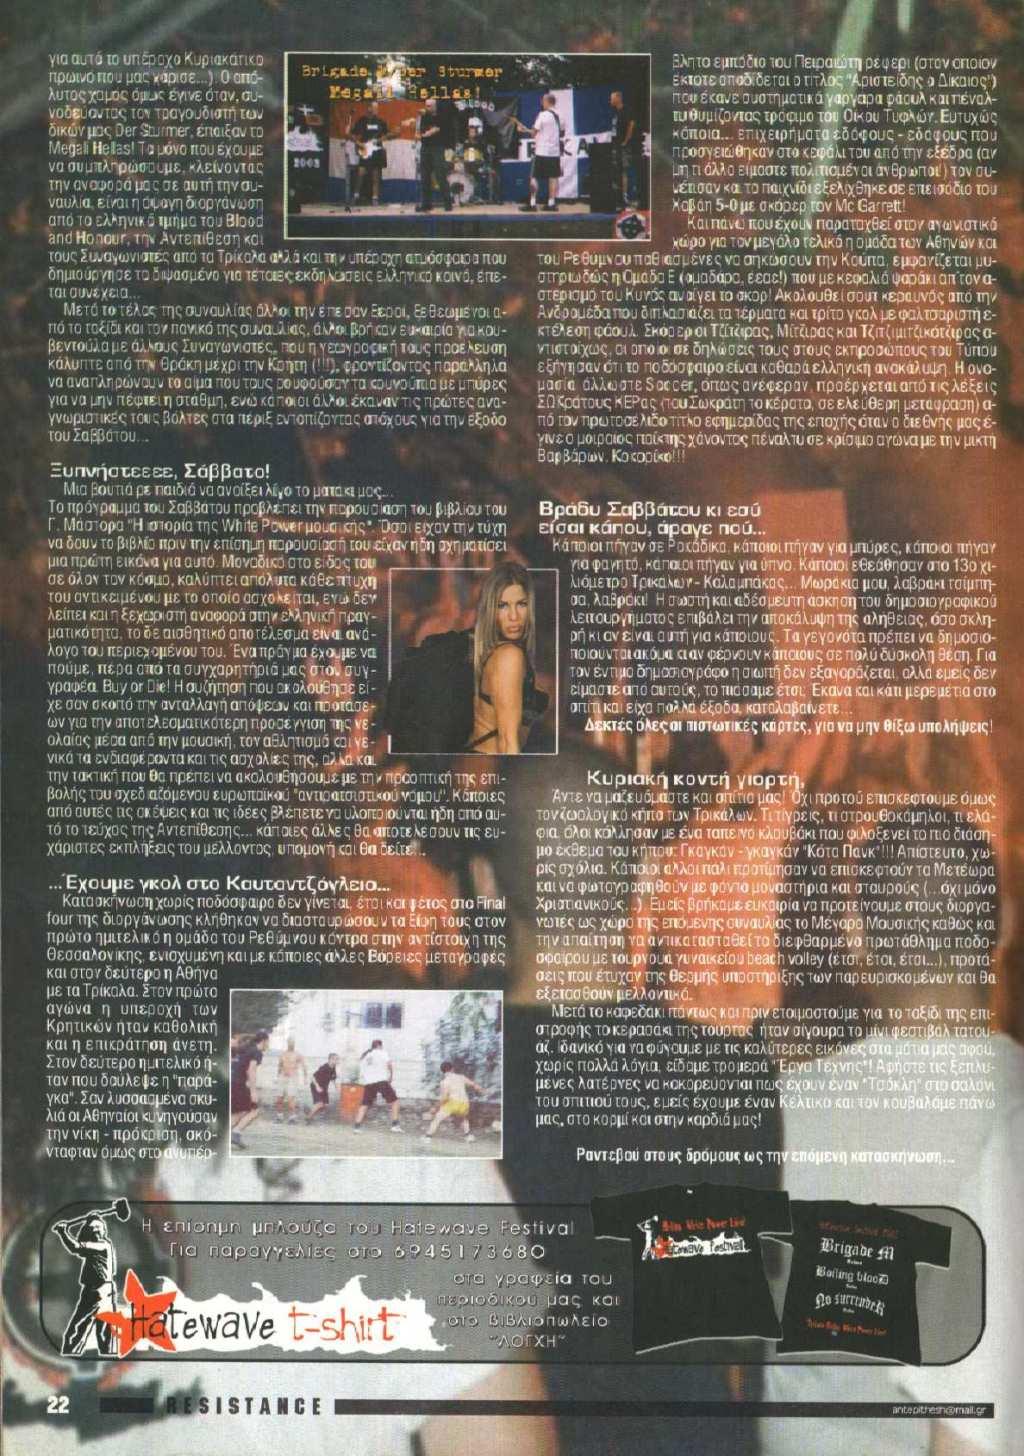 HateWave Φεστιβάλ White Power Κατασκήνωση 2003